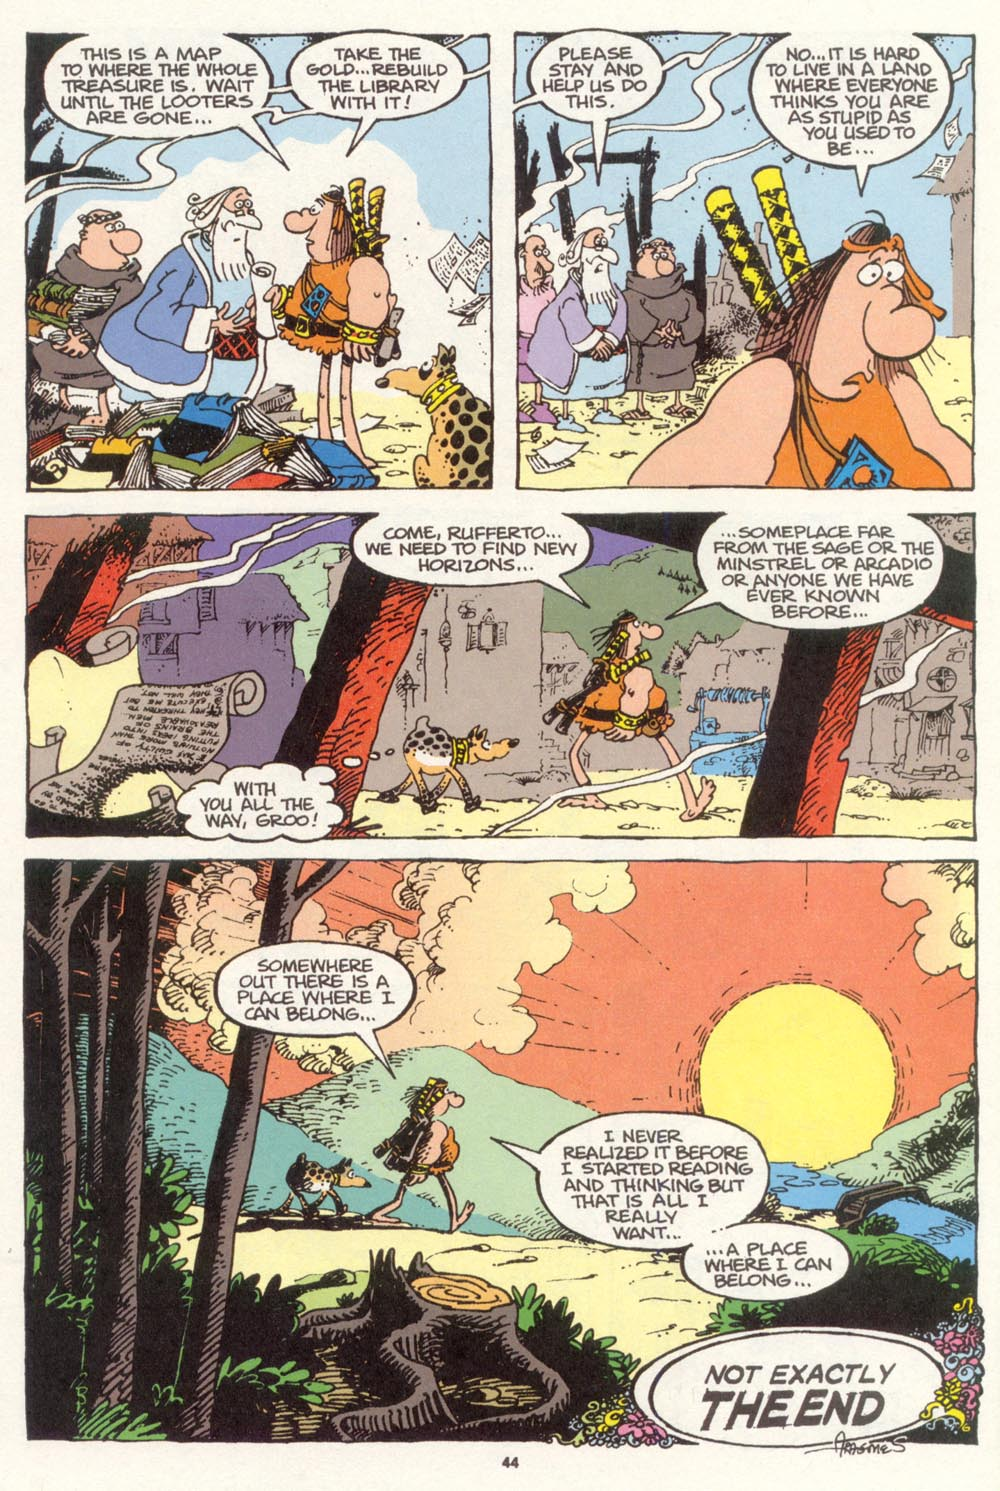 Read online Sergio Aragonés Groo the Wanderer comic -  Issue #100 - 45